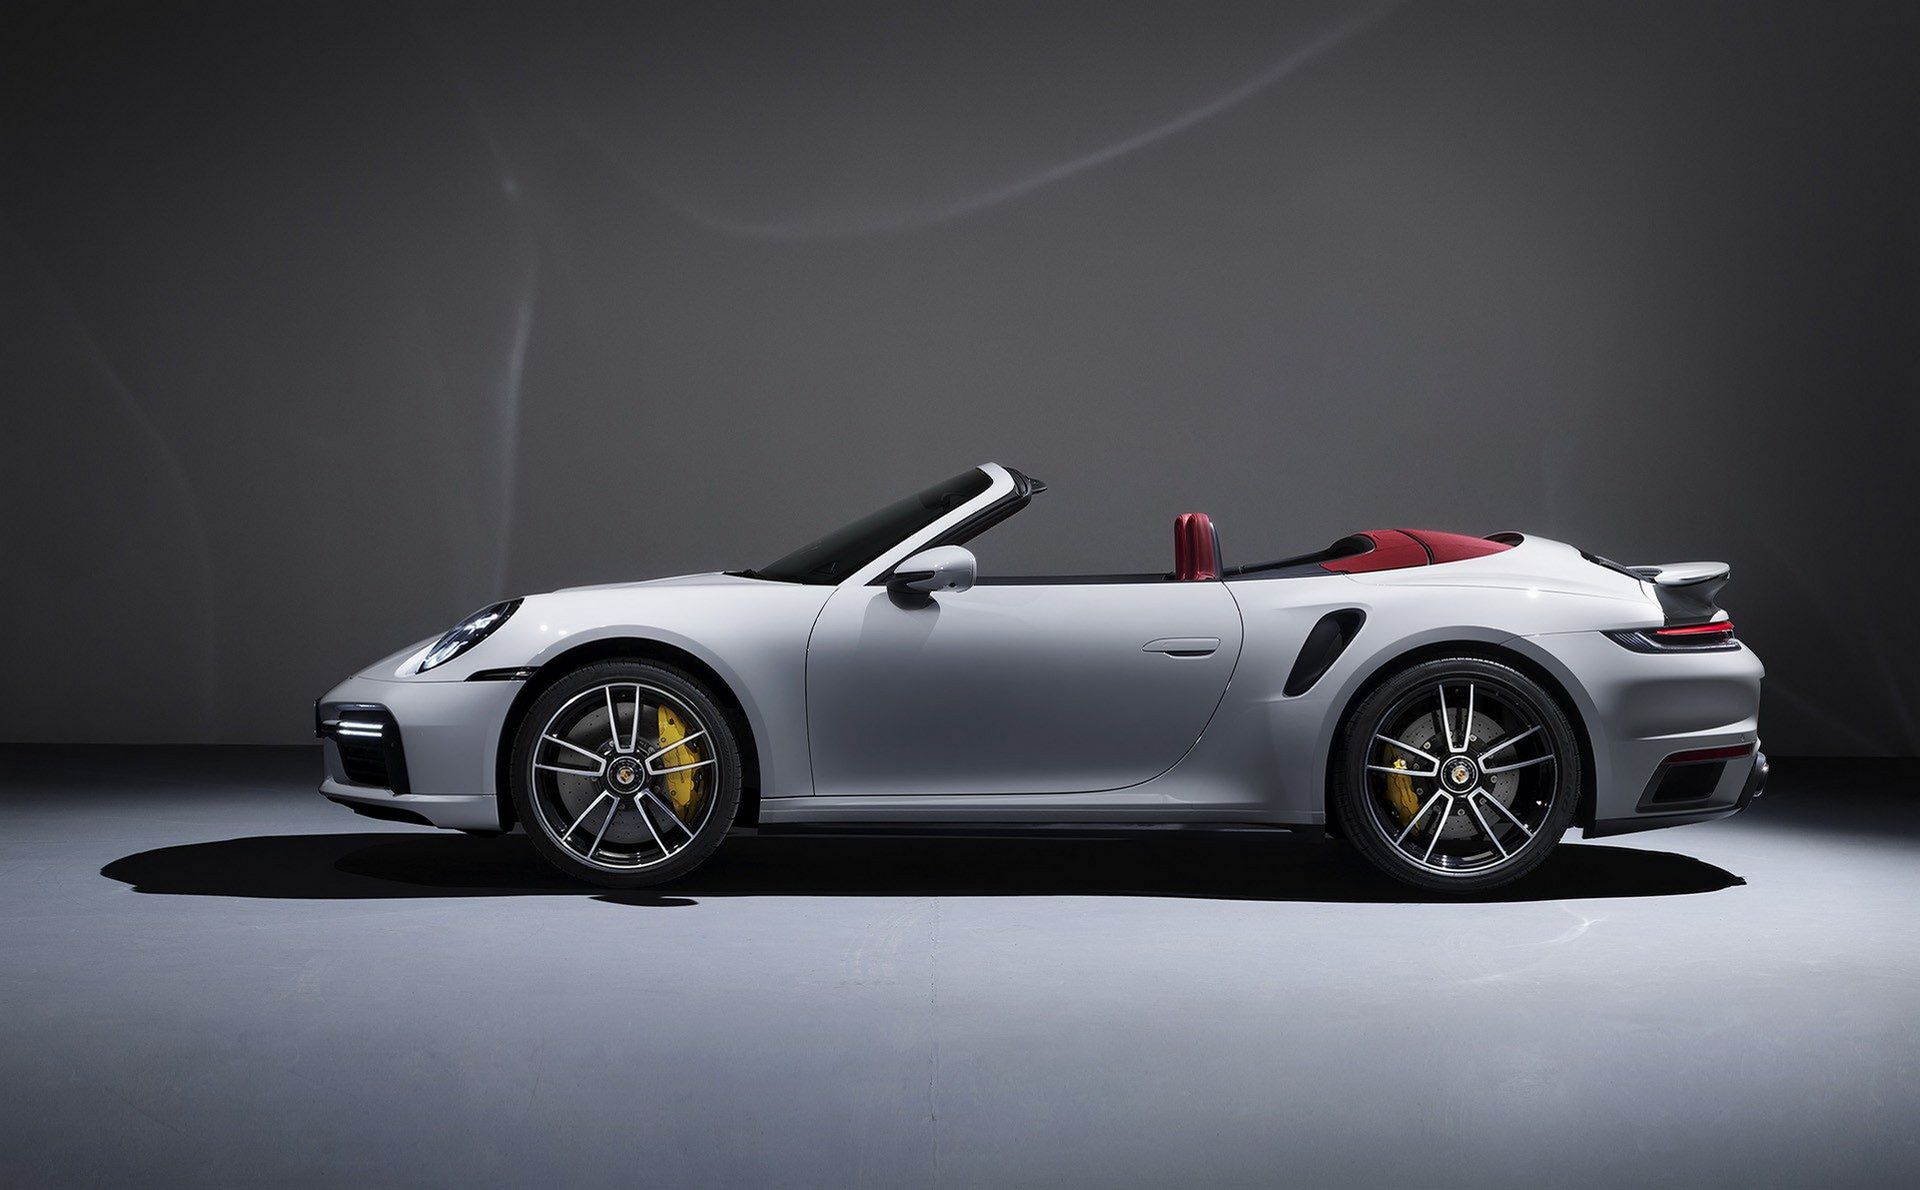 Porsche-911-Turbo-S-2020-43